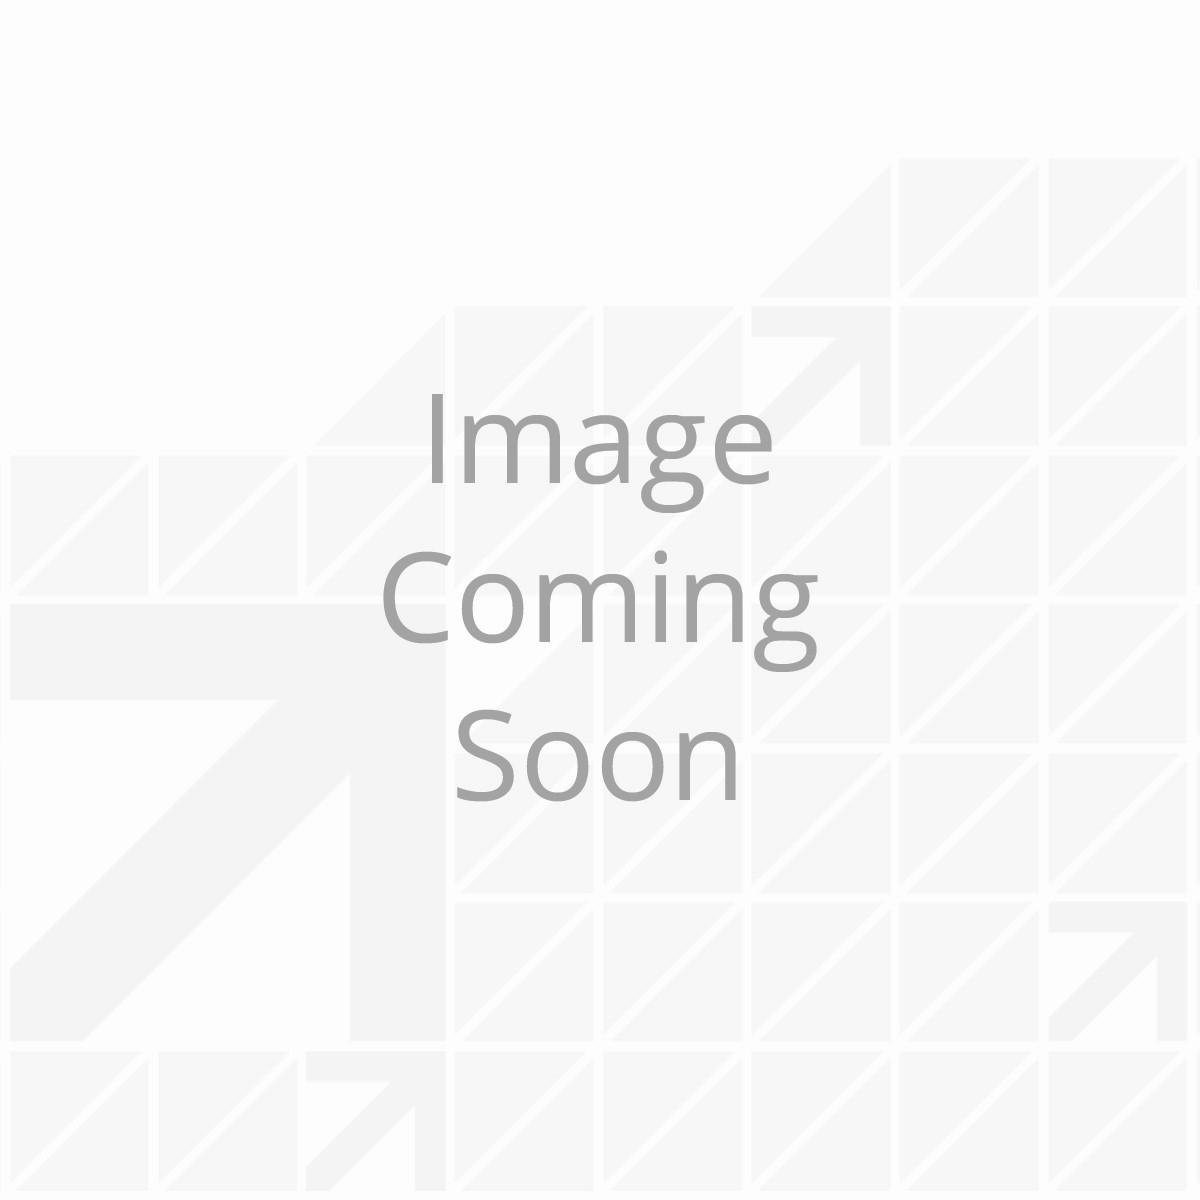 hydac-cartridge-valve-assembly